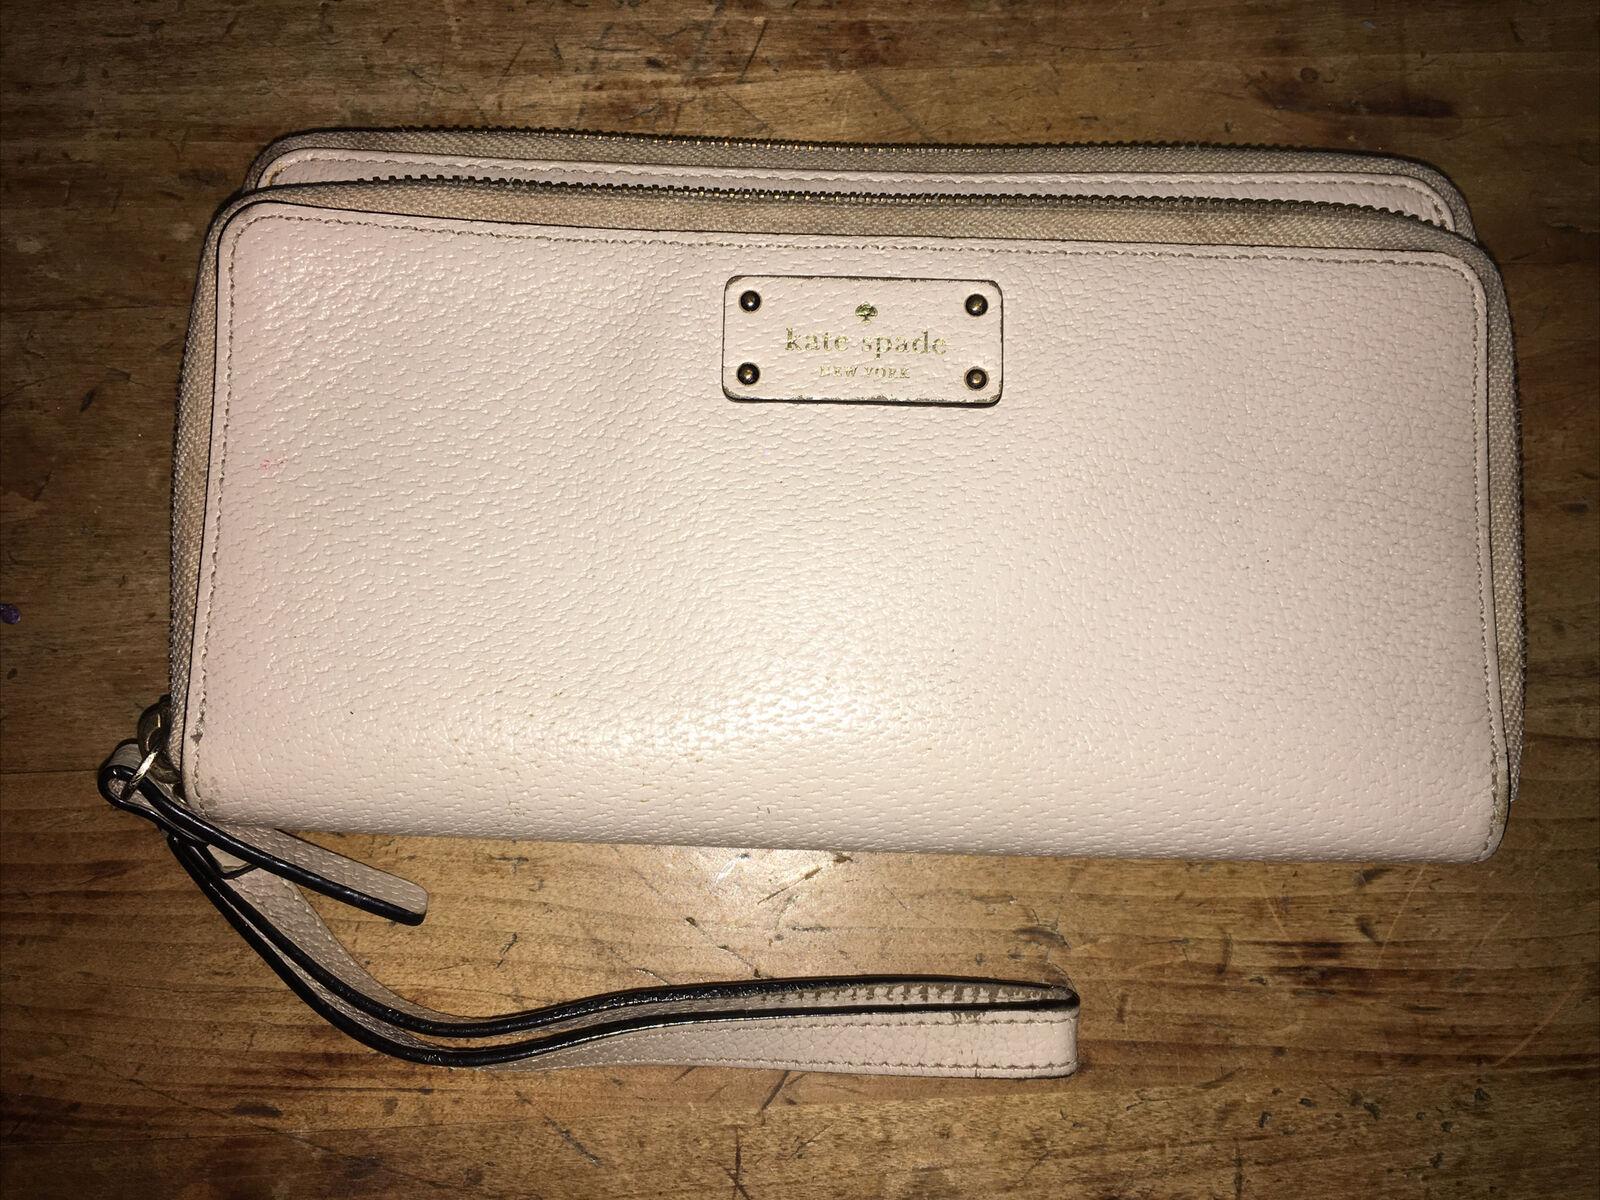 Authentic Kate Spade Taupe Tan Anita ? Grove Street Double Zip Wristlet Wallet